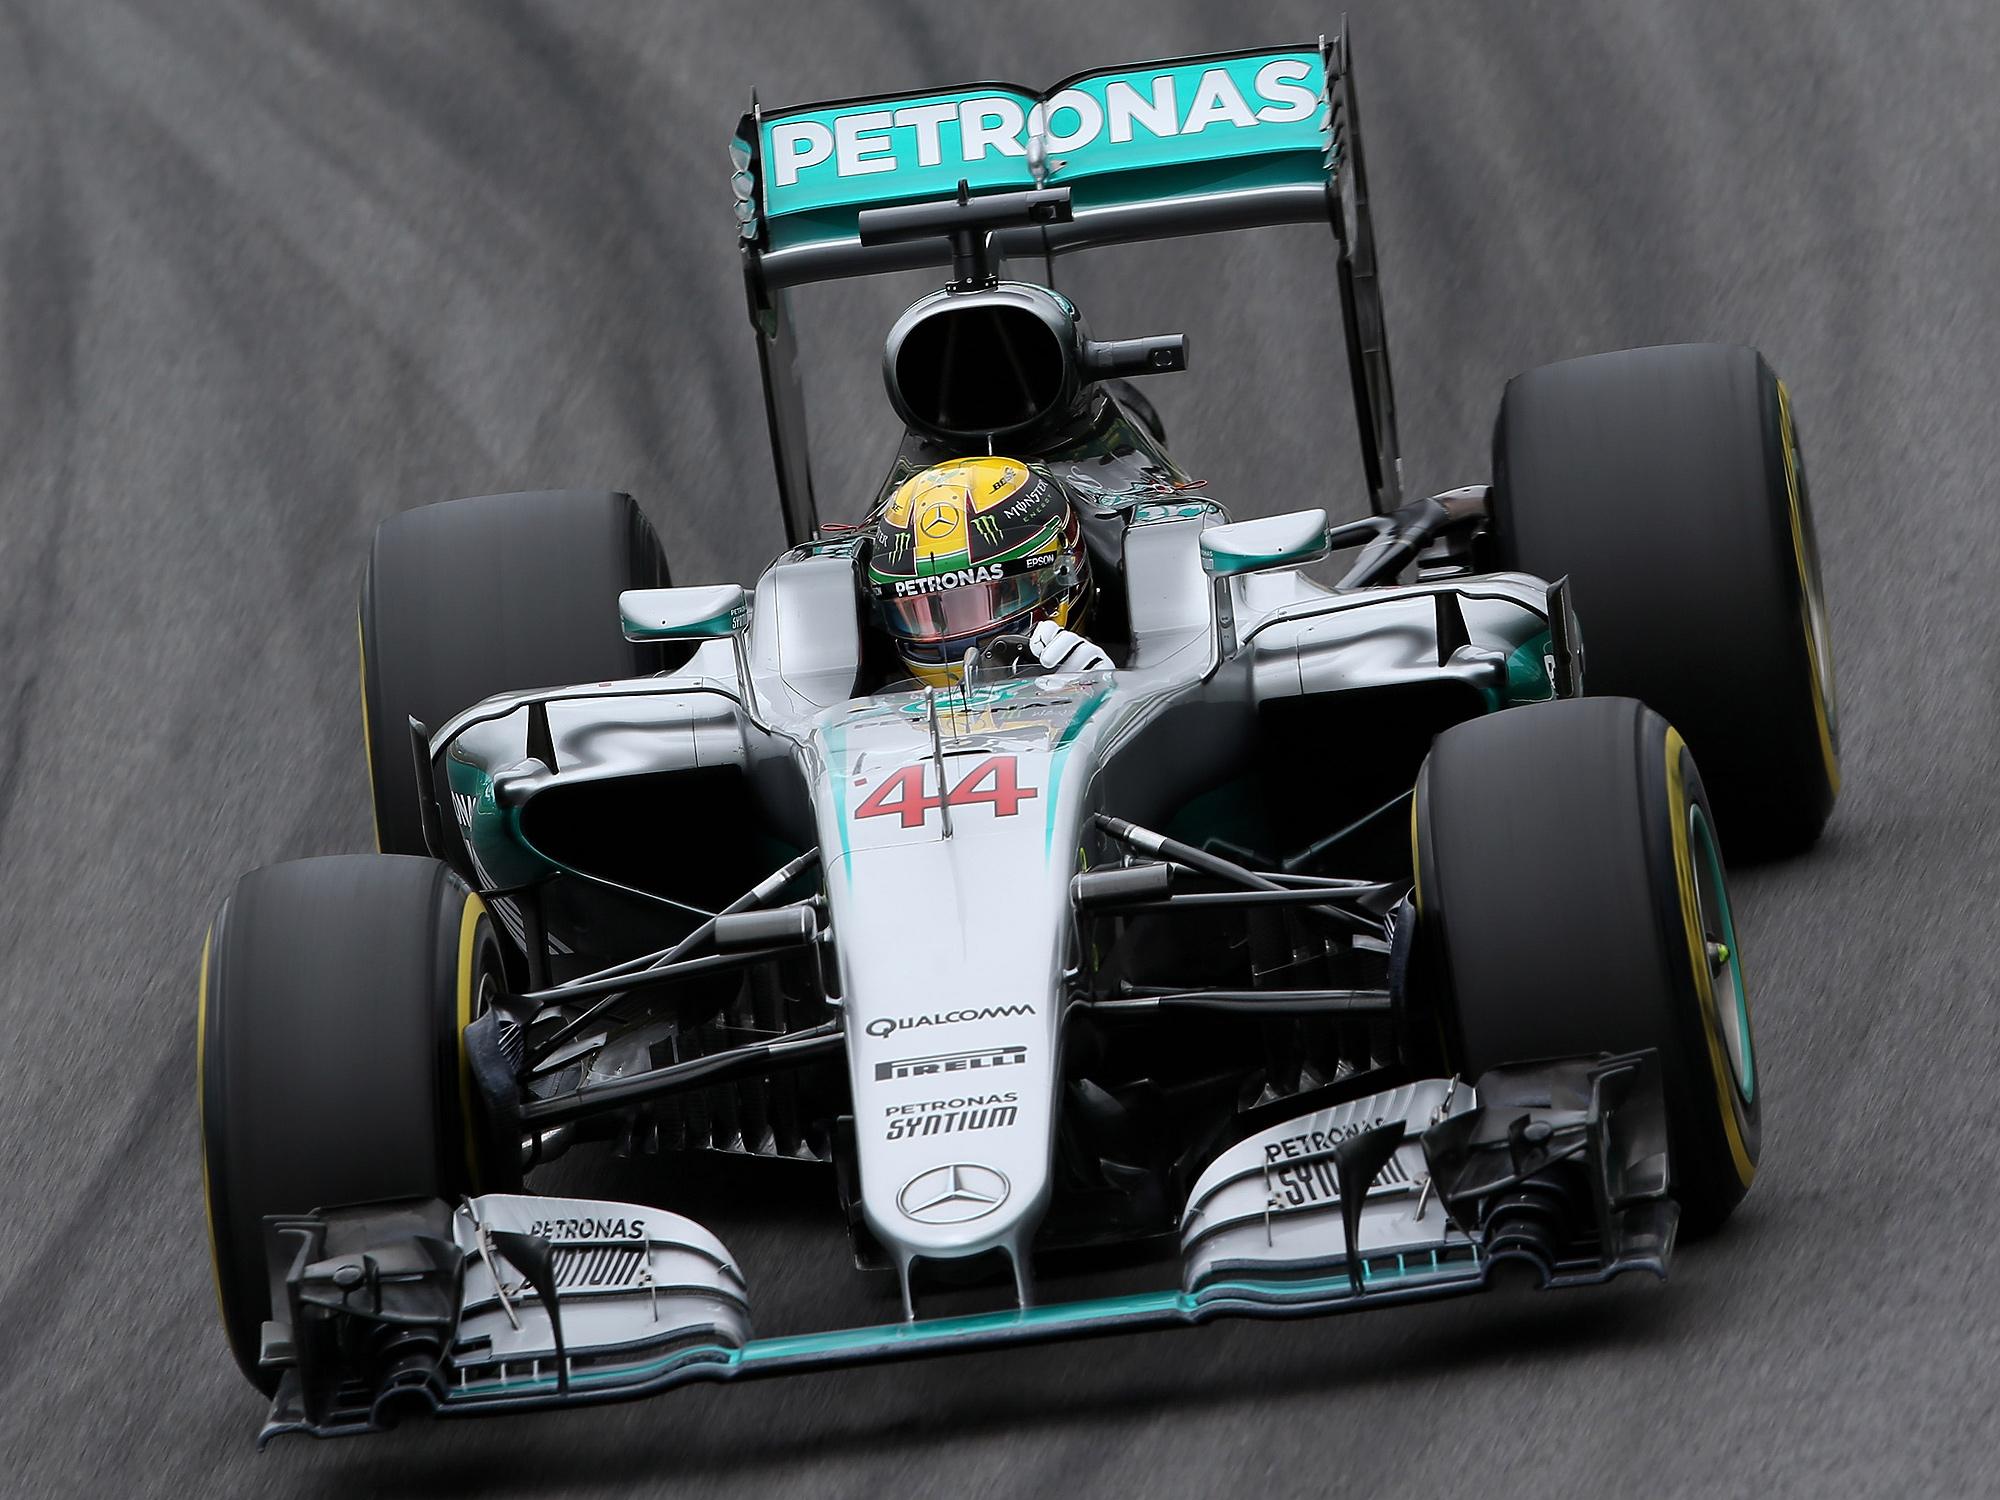 F1 star Lewis Hamilton looks ahead to 2017